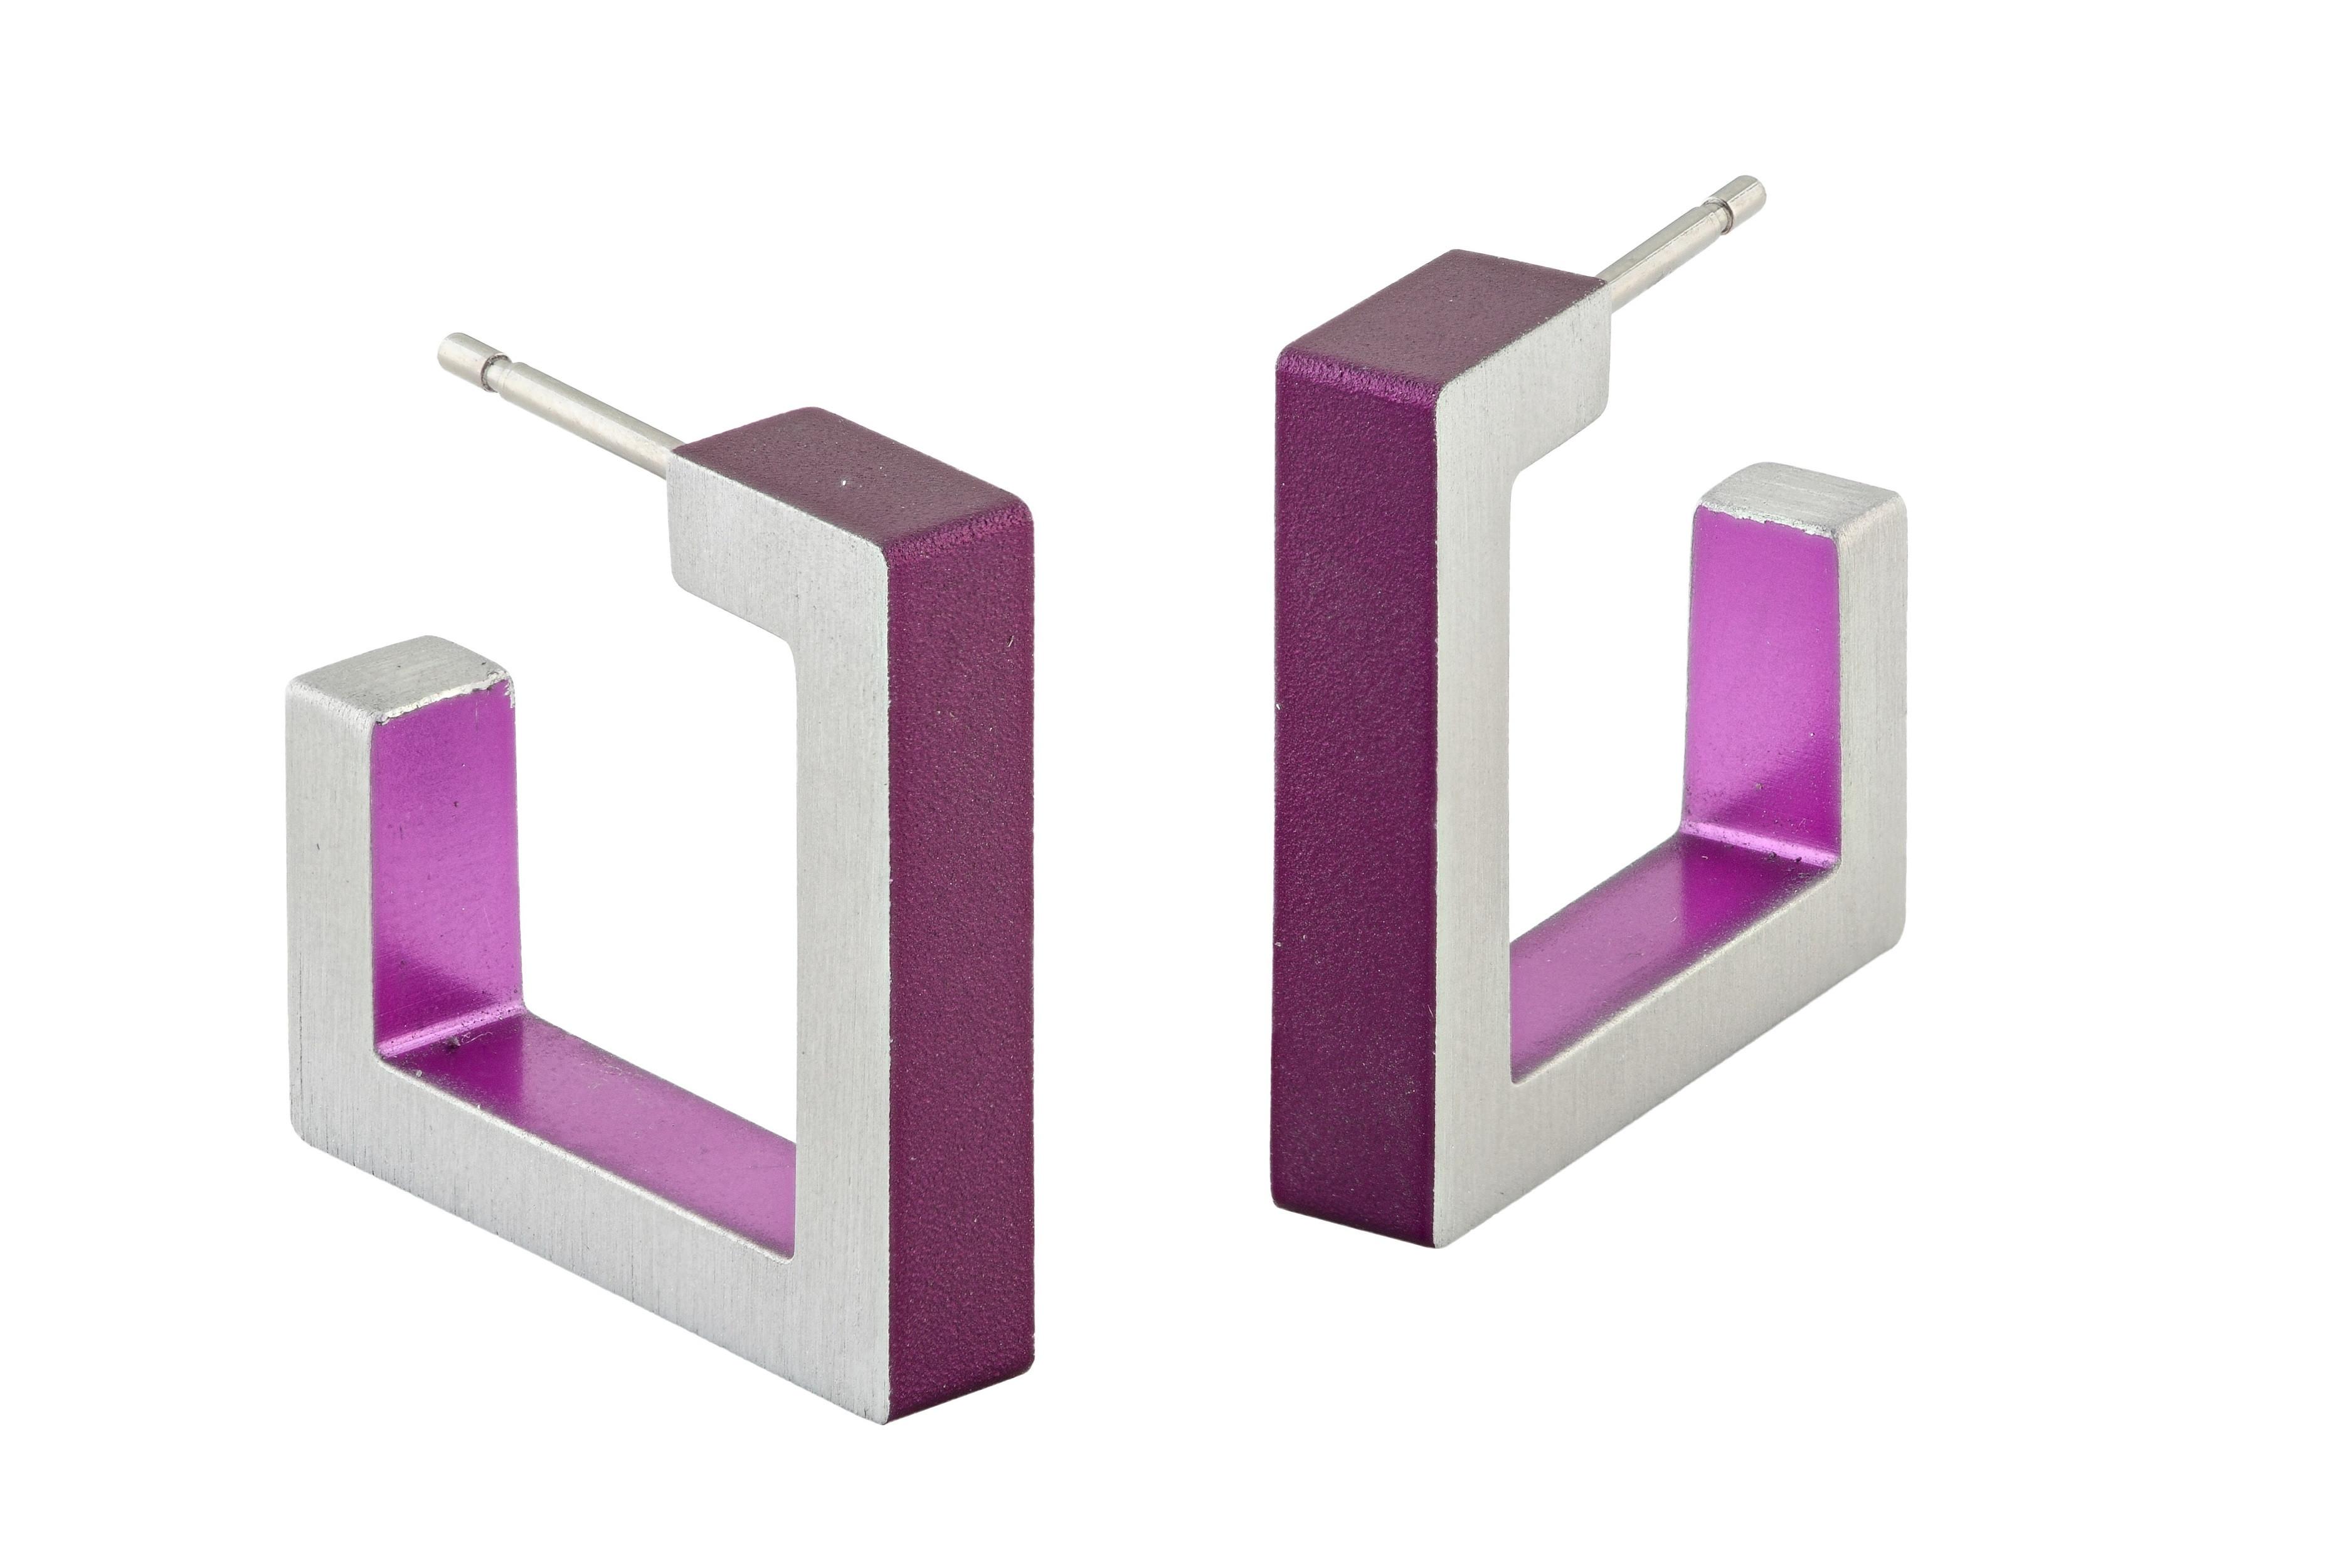 Design dames accessoires vind je bij shop.holland.com